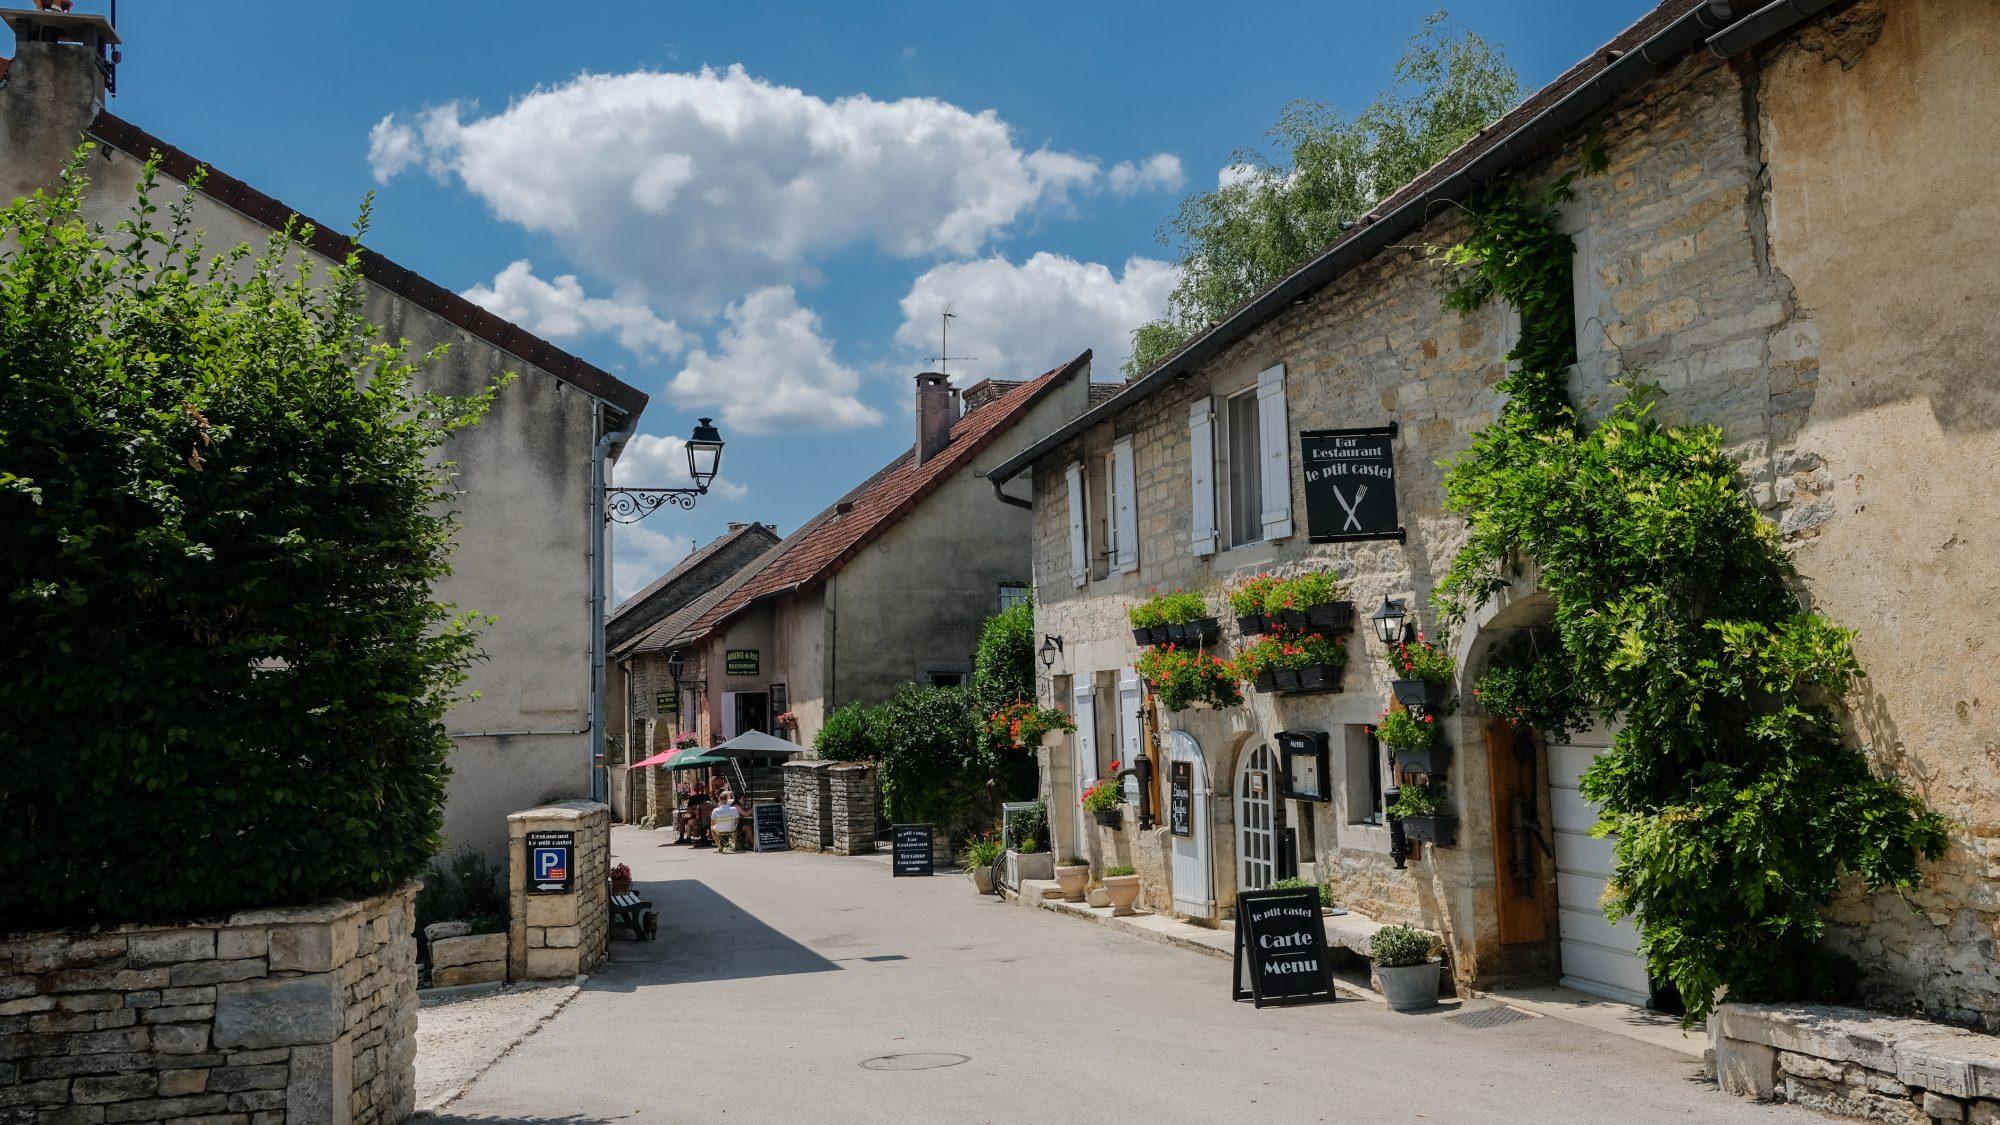 Rue de Chateau Chalon - Chateau-Chalon, Jura